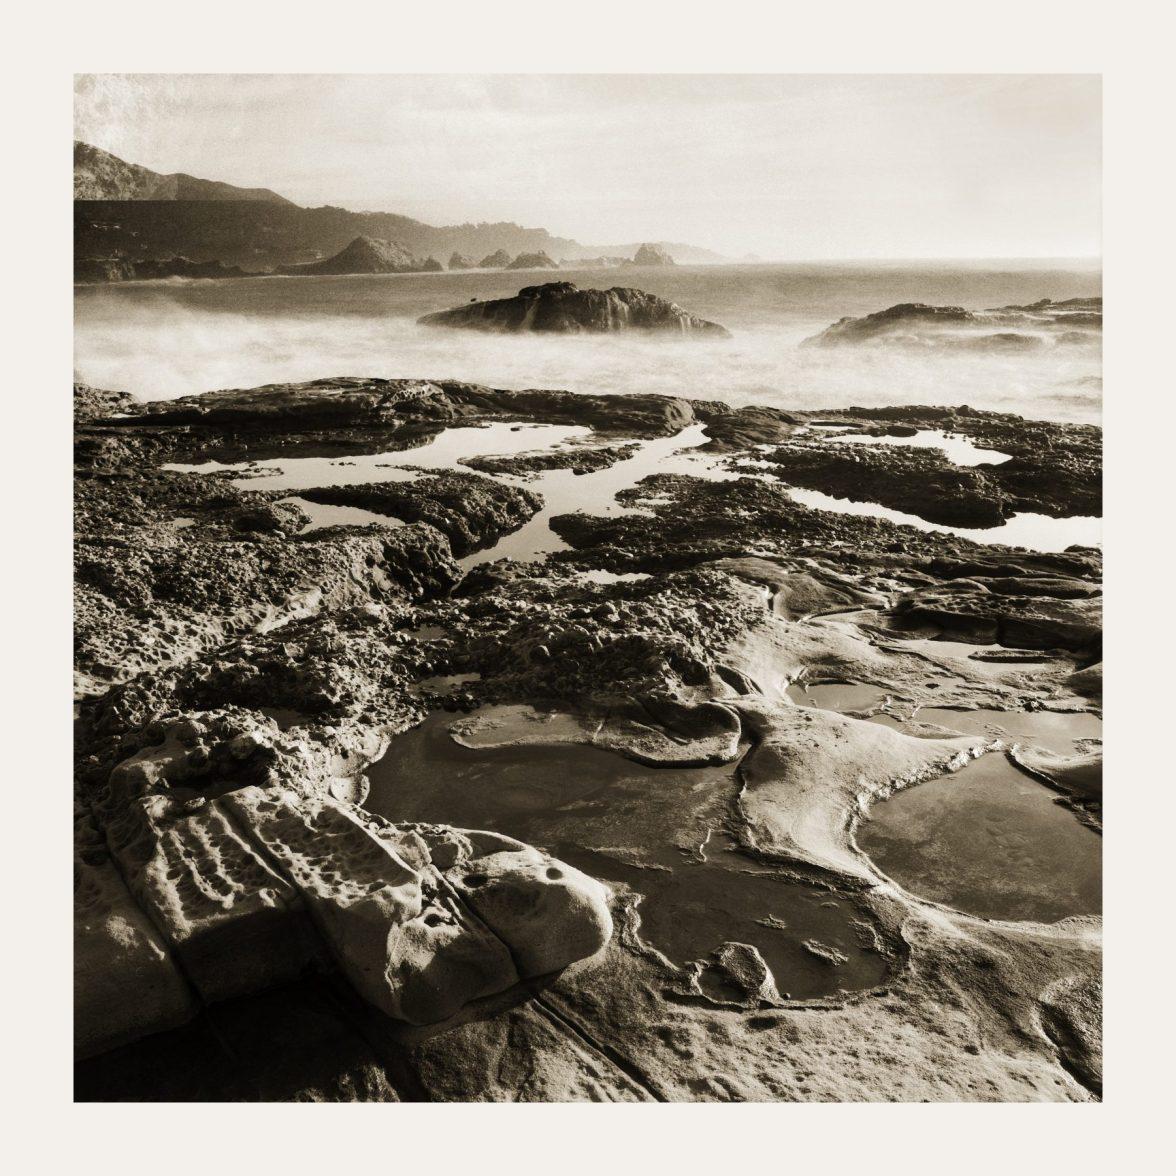 Pot Holes Pt. Lobos © Jack Wasserbach